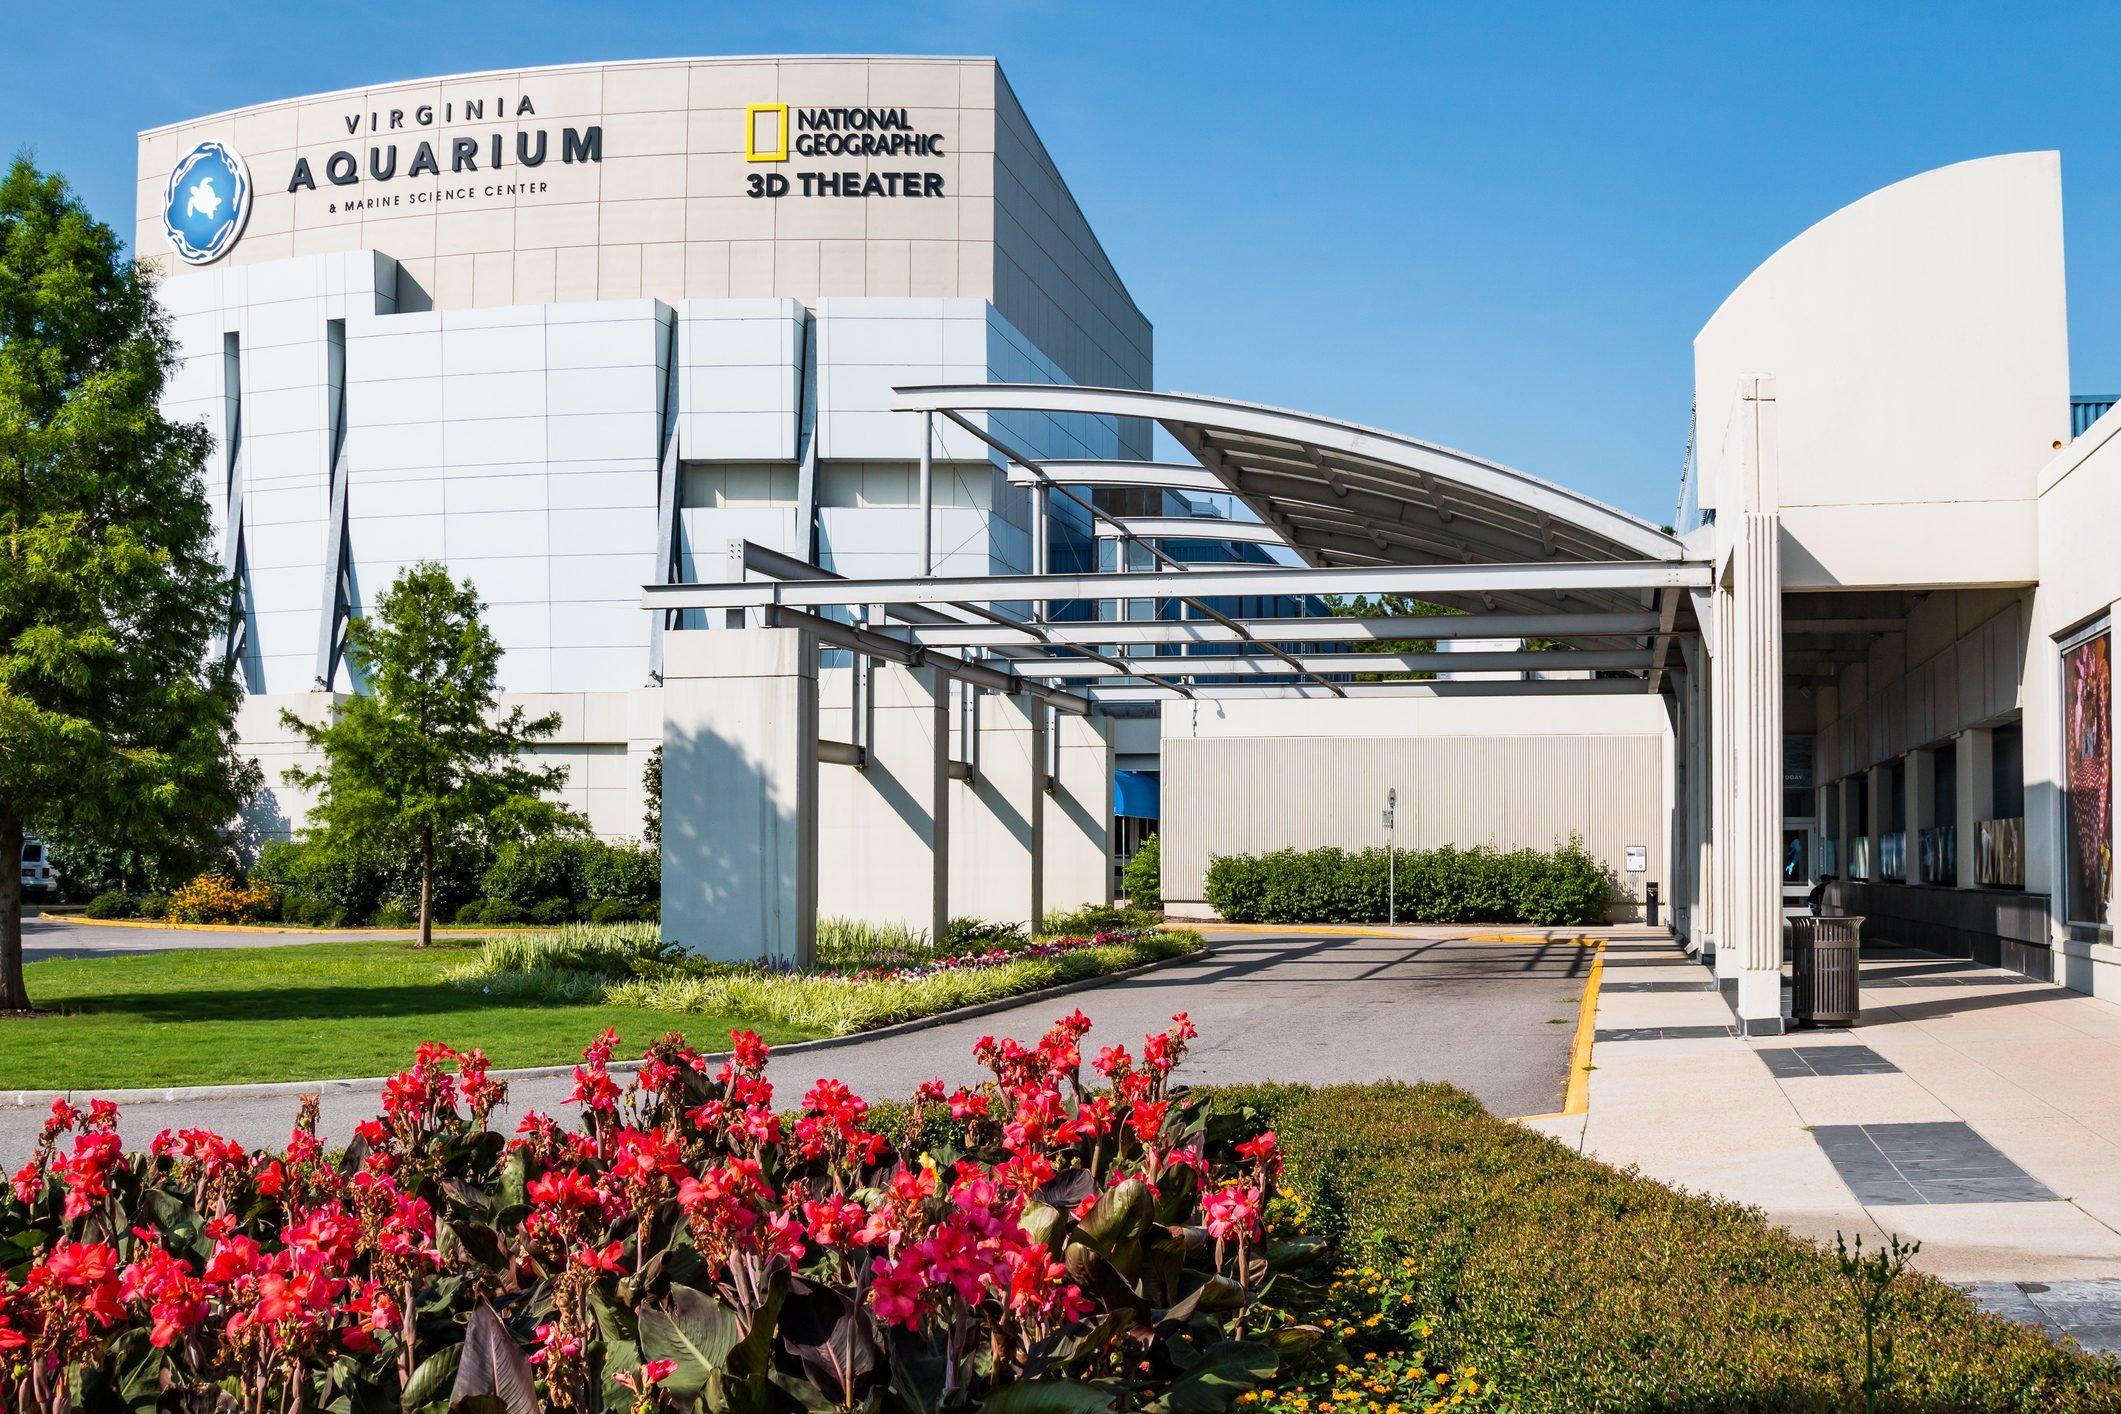 Virginia Aquarium & Marine Science Center With Red Flowers in Foreground